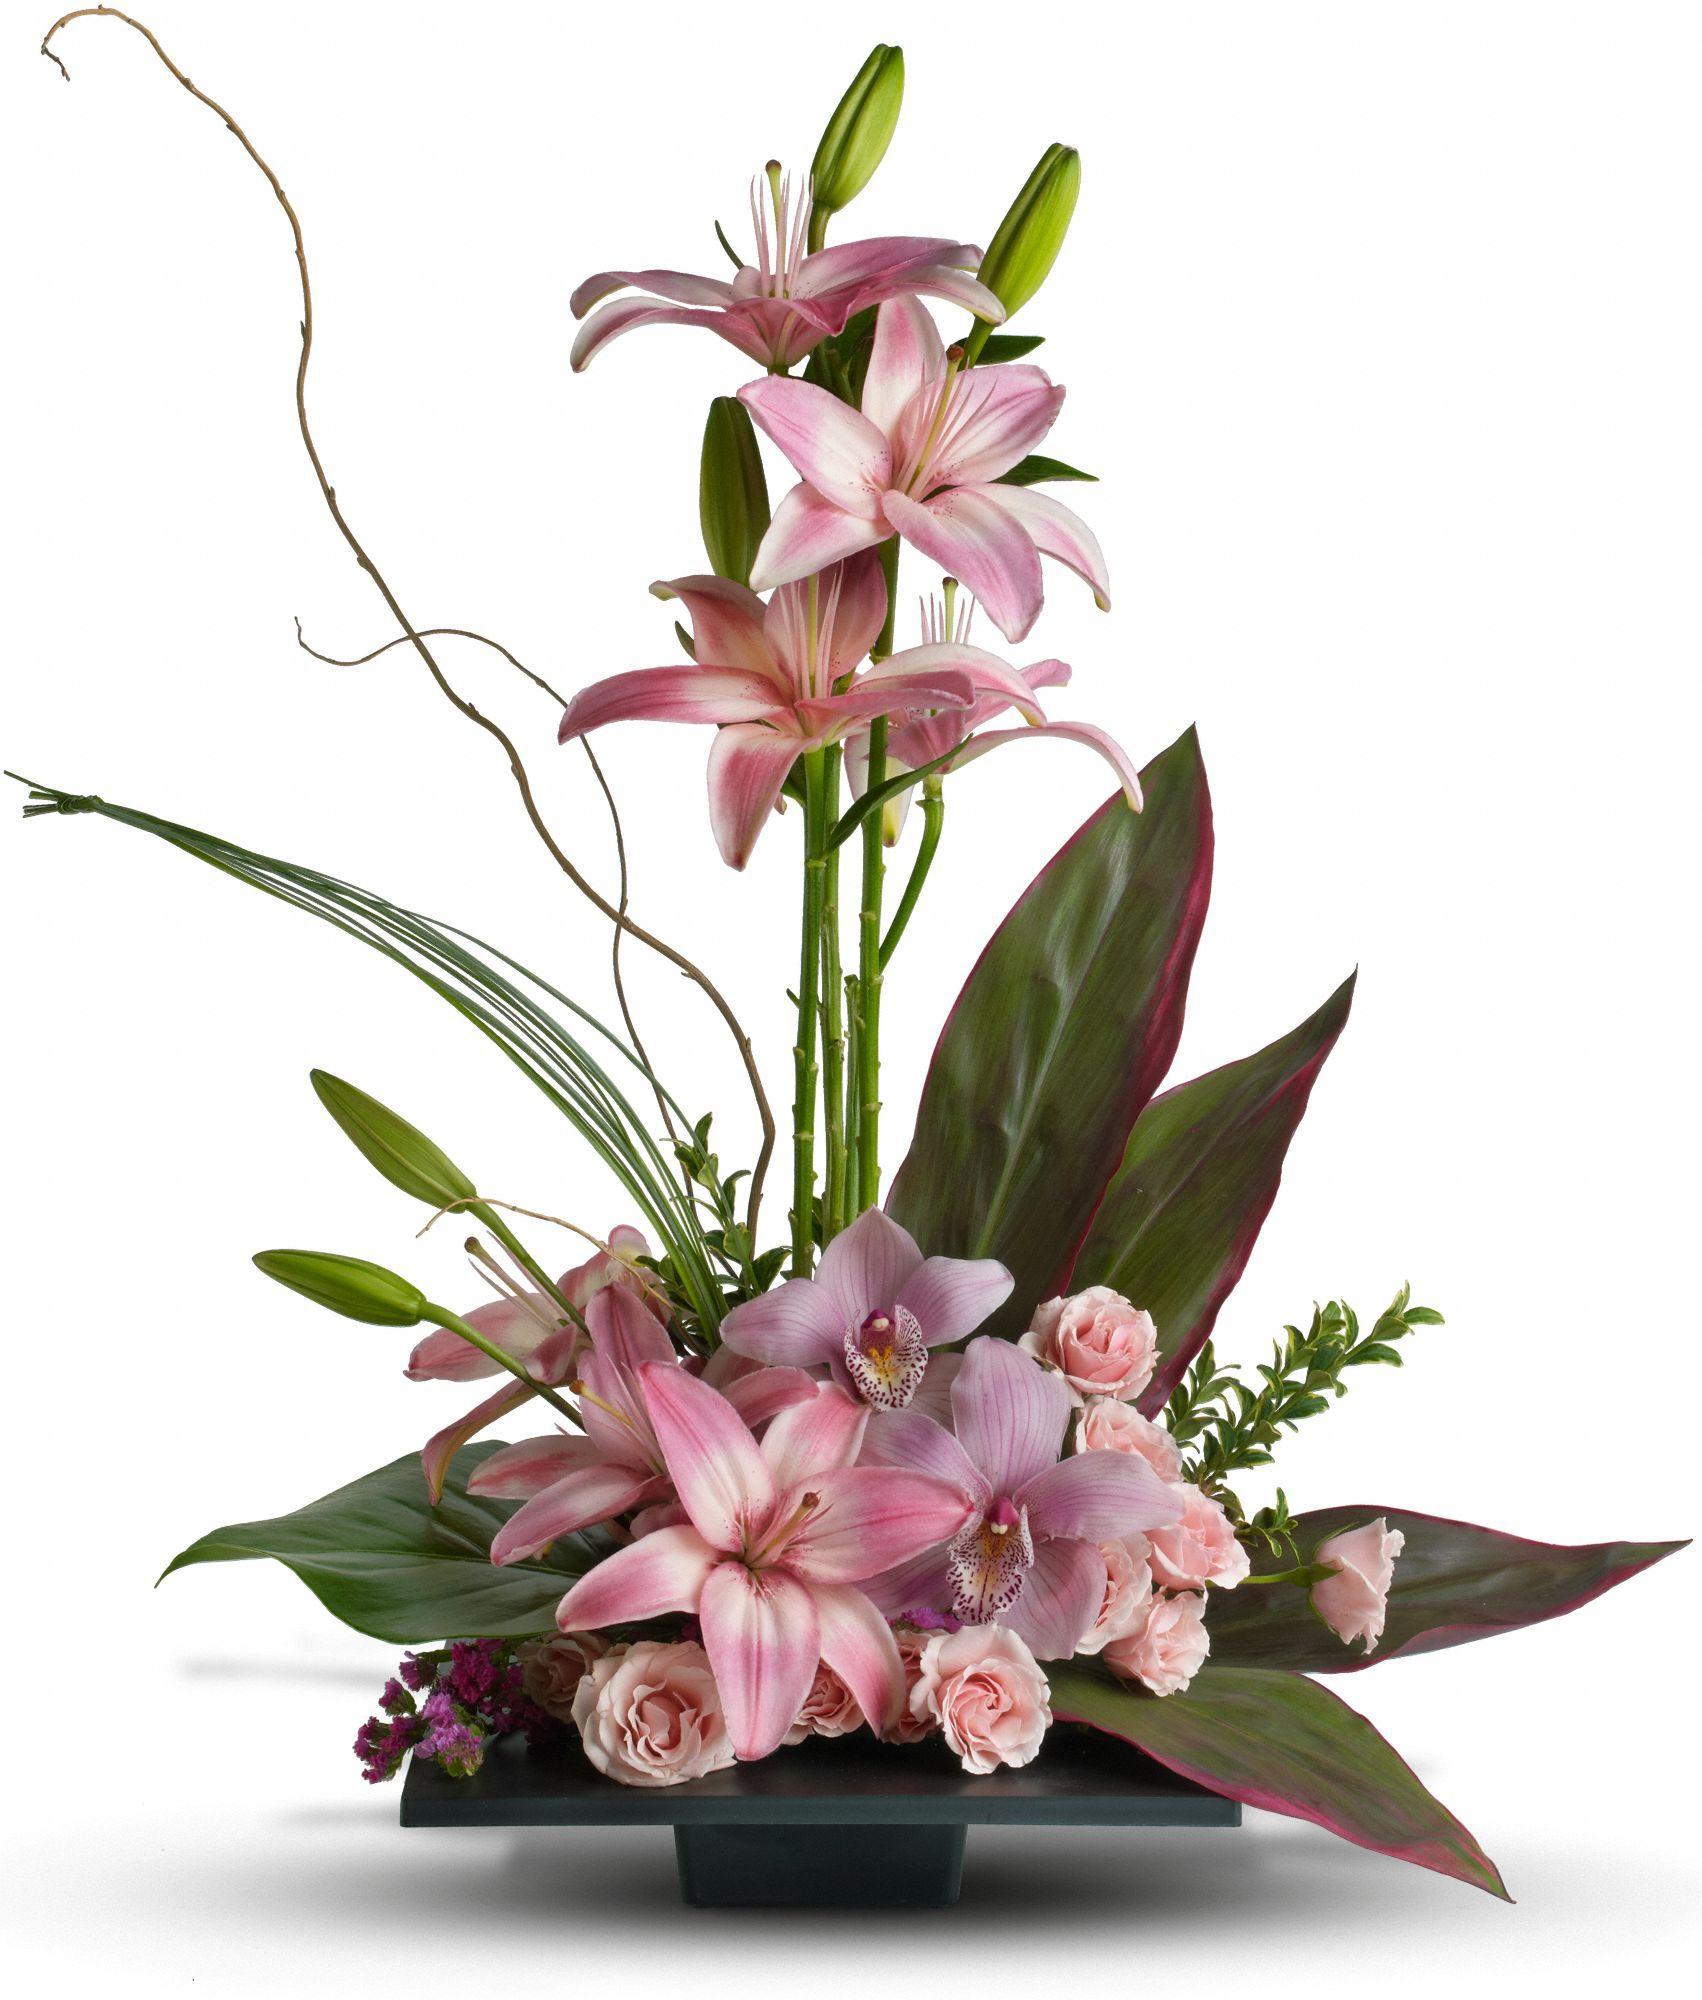 Imagination blooms with cymbidium orchids flowers imagination imagination blooms with cymbidium orchids flowers imagination blooms with cymbidium orchids flower bouquet teleflora izmirmasajfo